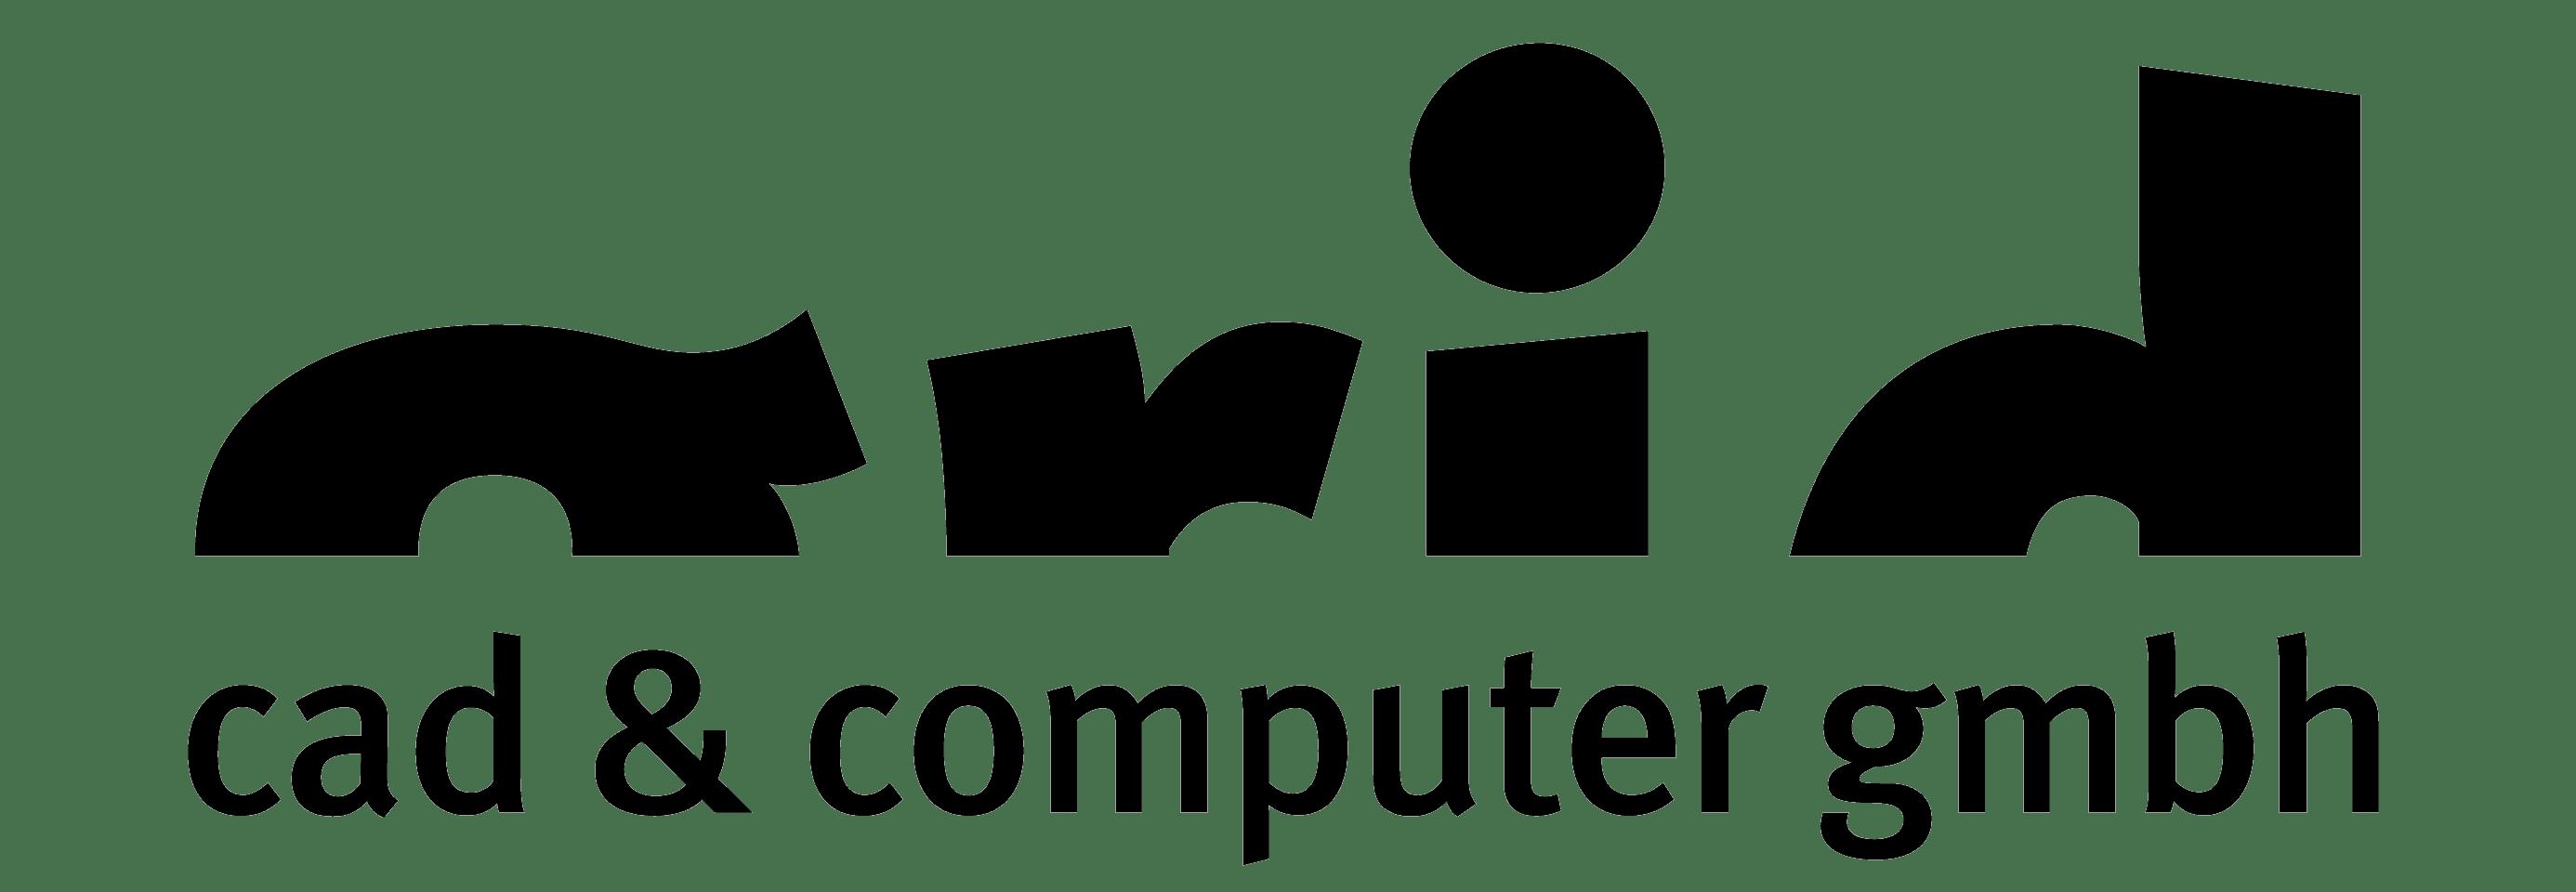 grid cad & computer gmbh